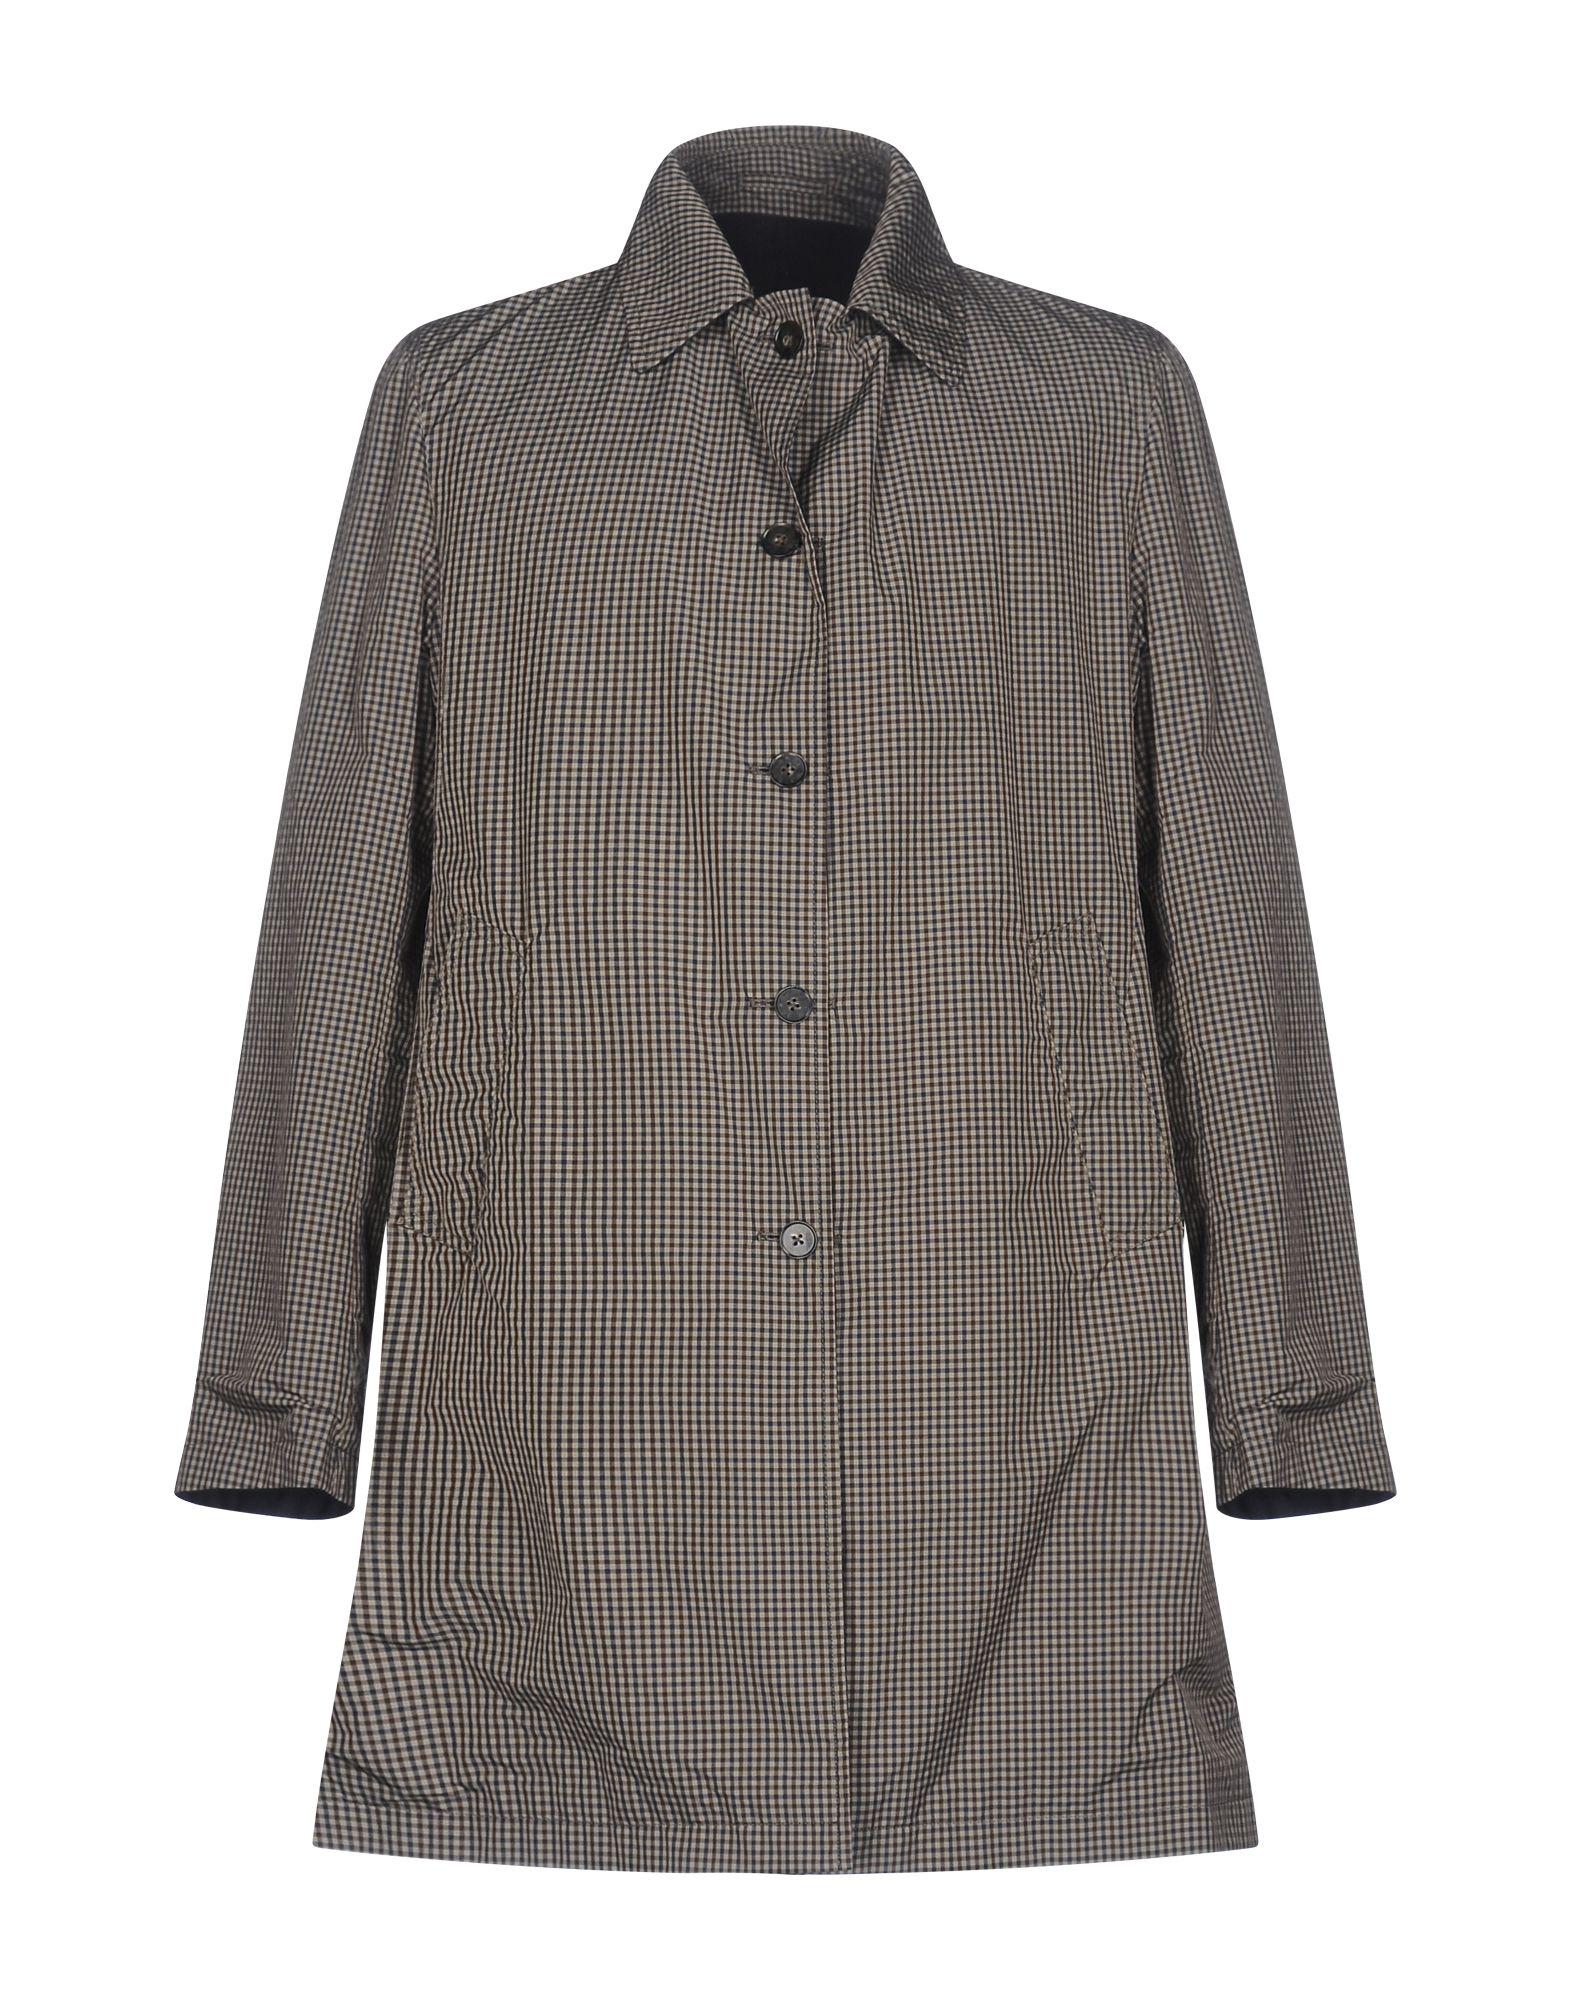 RVR LARDINI Full-Length Jacket in Khaki